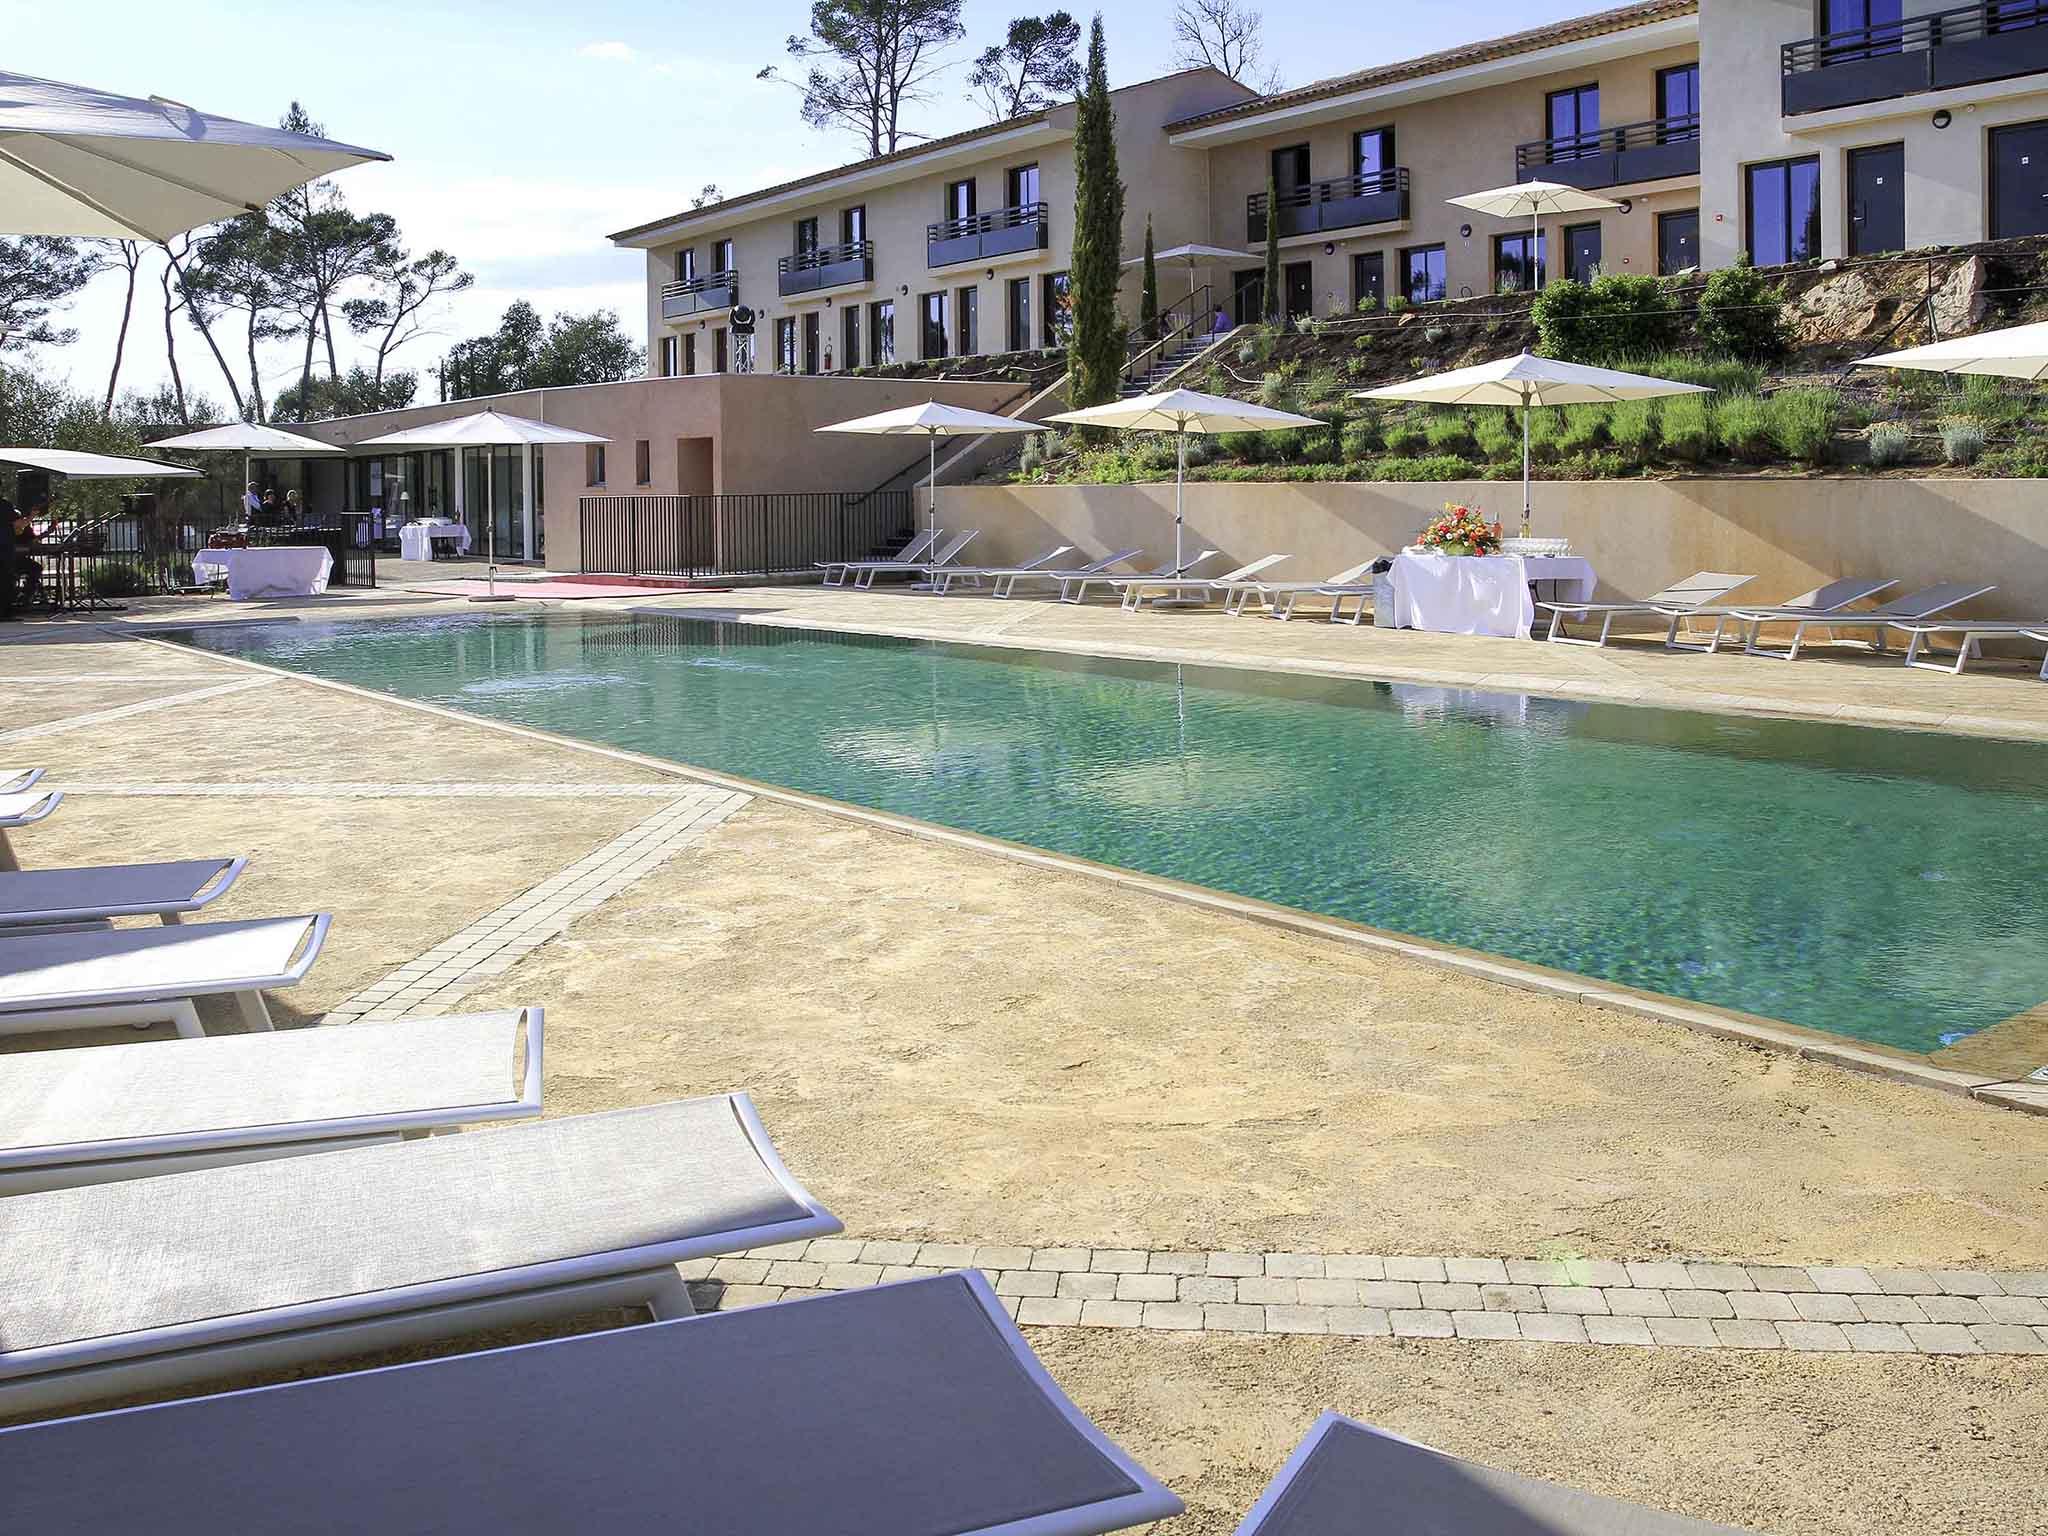 فندق - Hôtel Mercure Brignoles Golf de Barbaroux